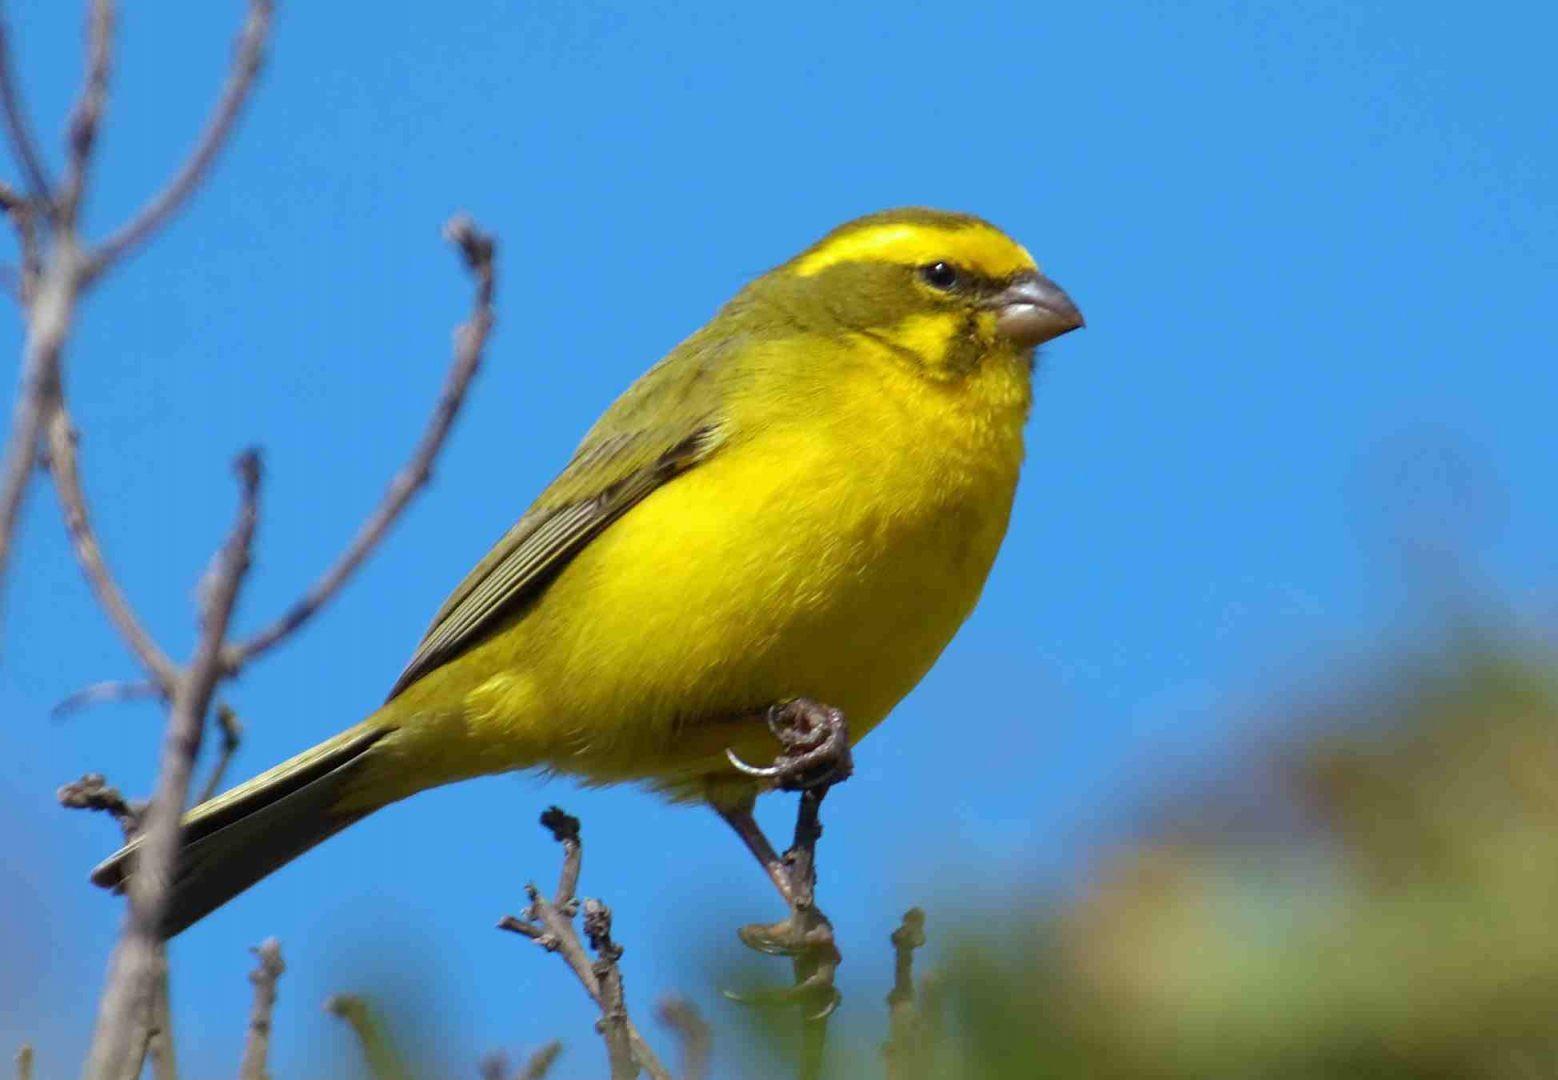 canario-silvestre-amarillo.jpg